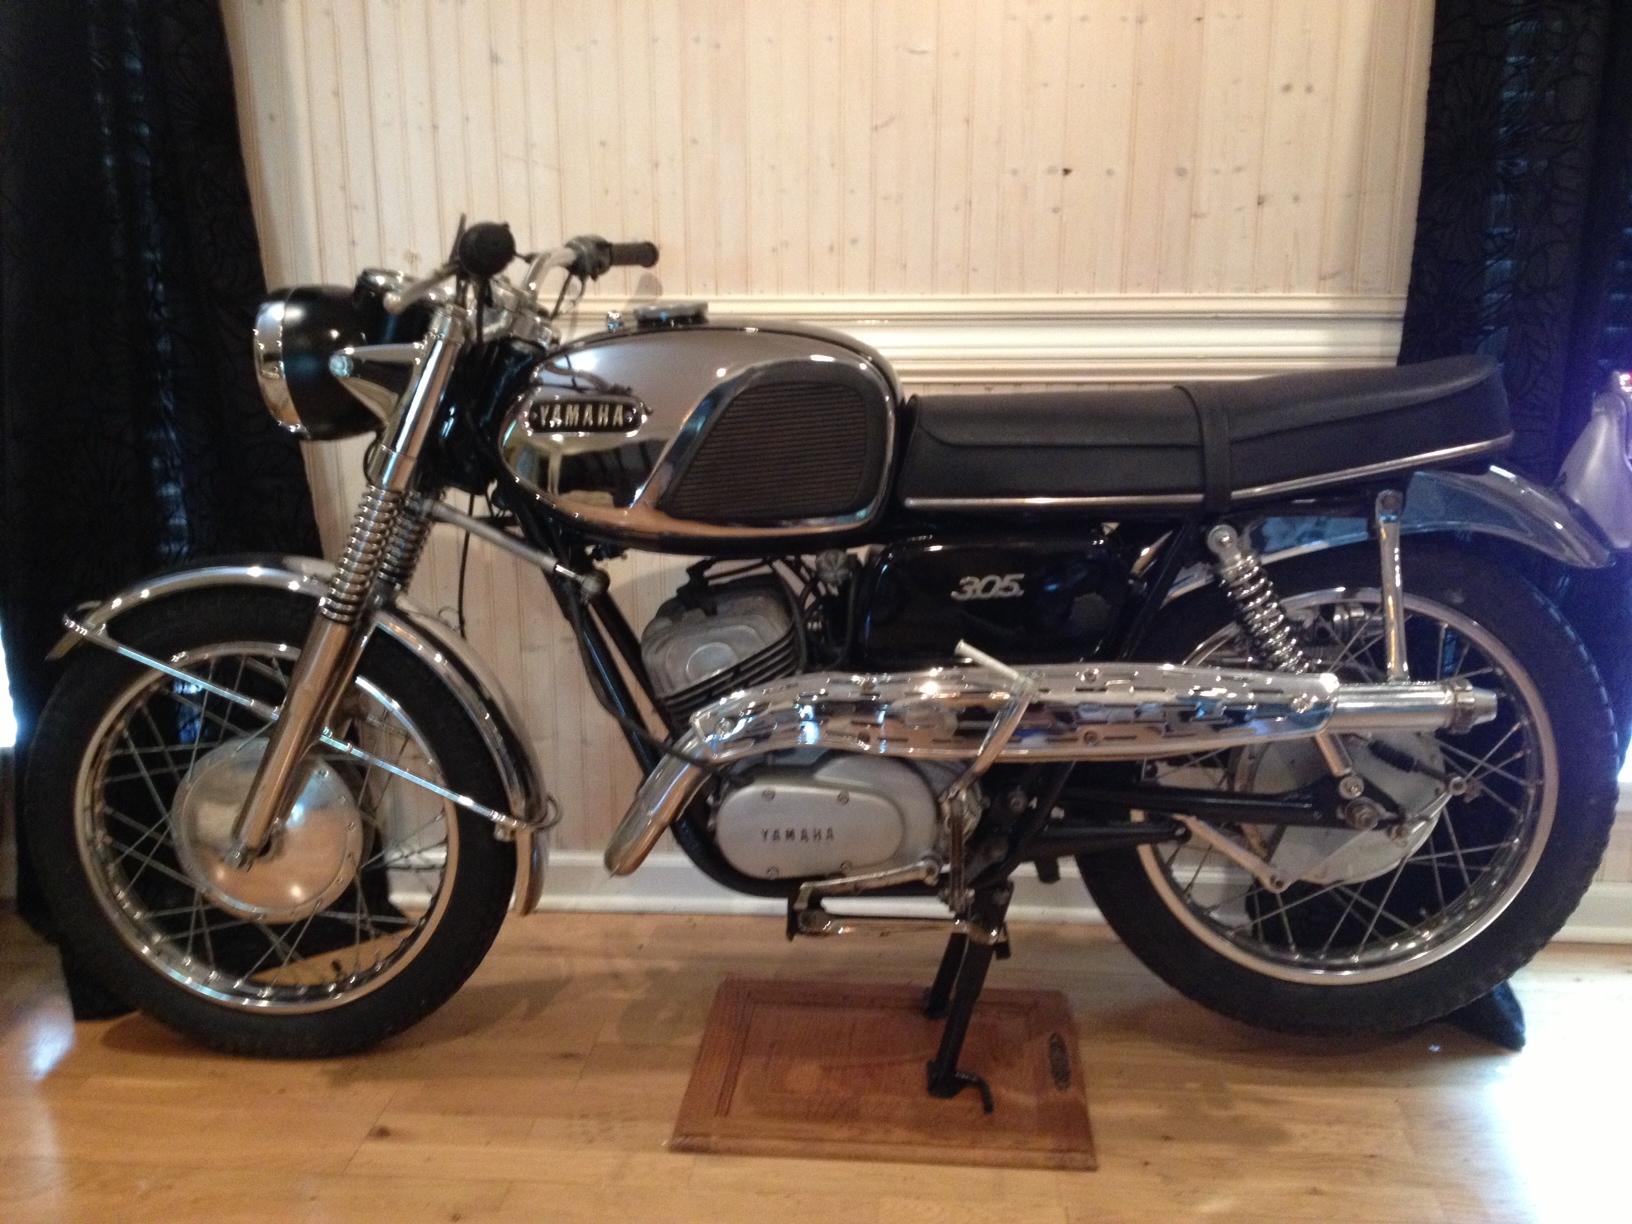 Hondas For Sale >> 1966 Yamaha Big Bear Scrambler 2-Stroke